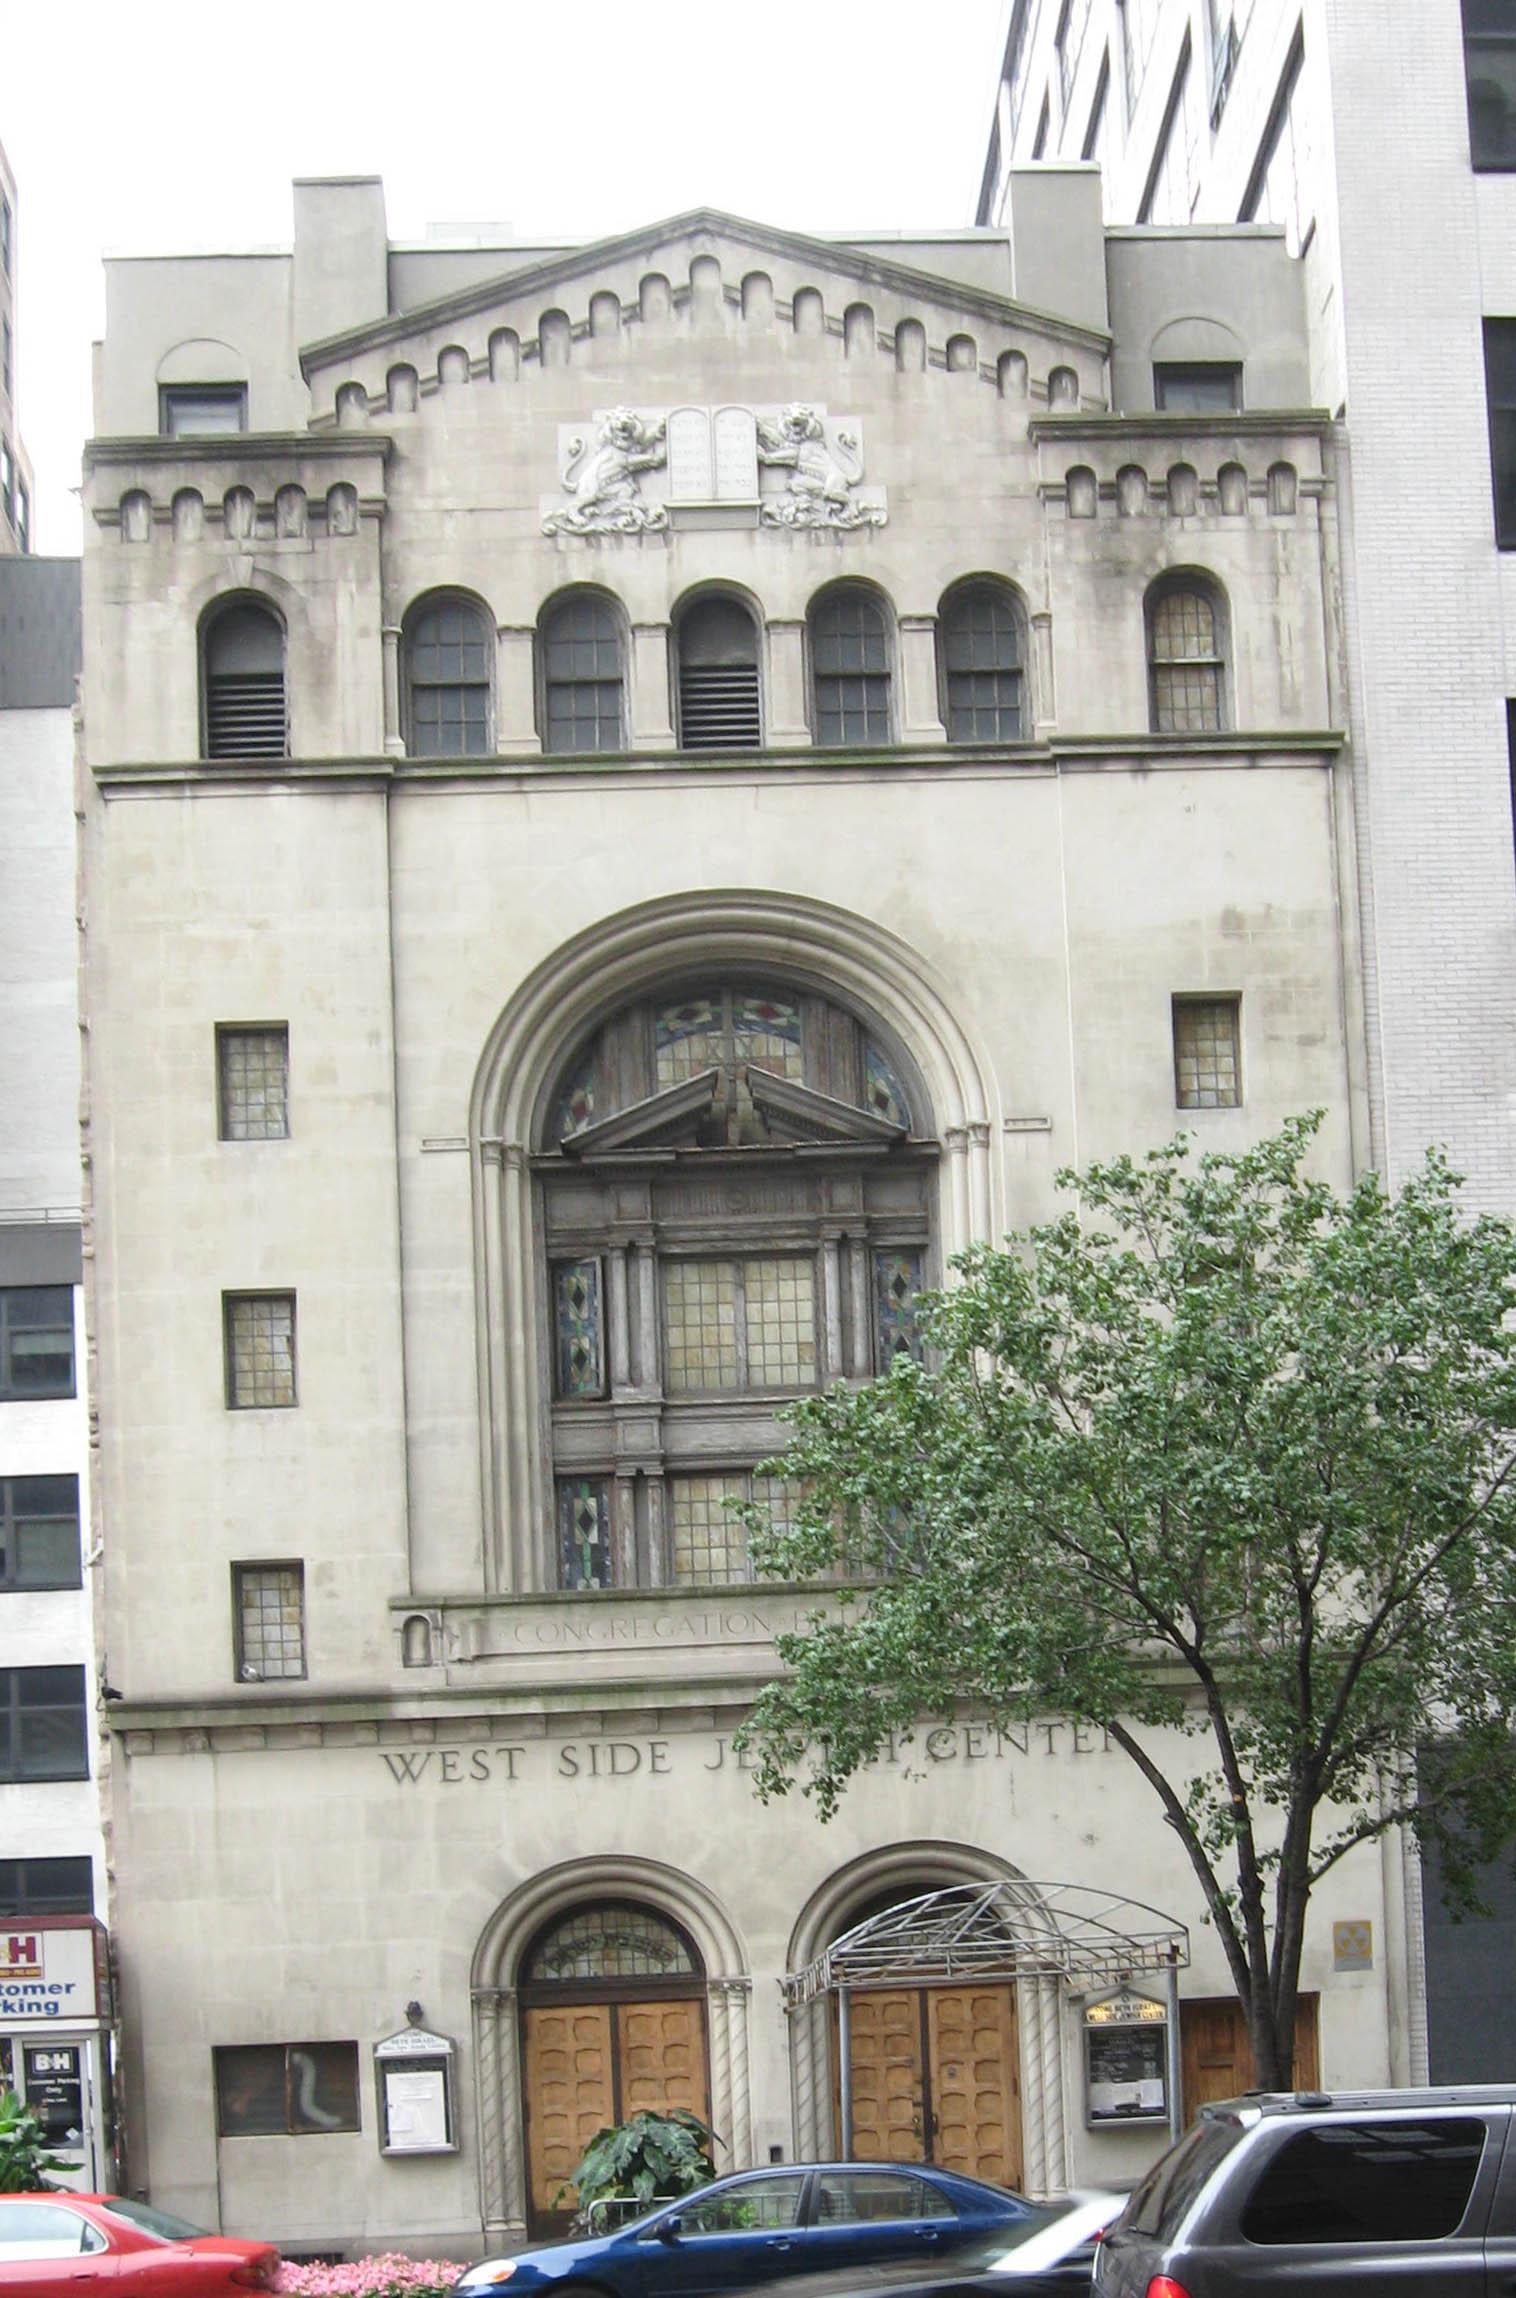 Congregation Beth Israel West Side Jewish Center - Wikipedia